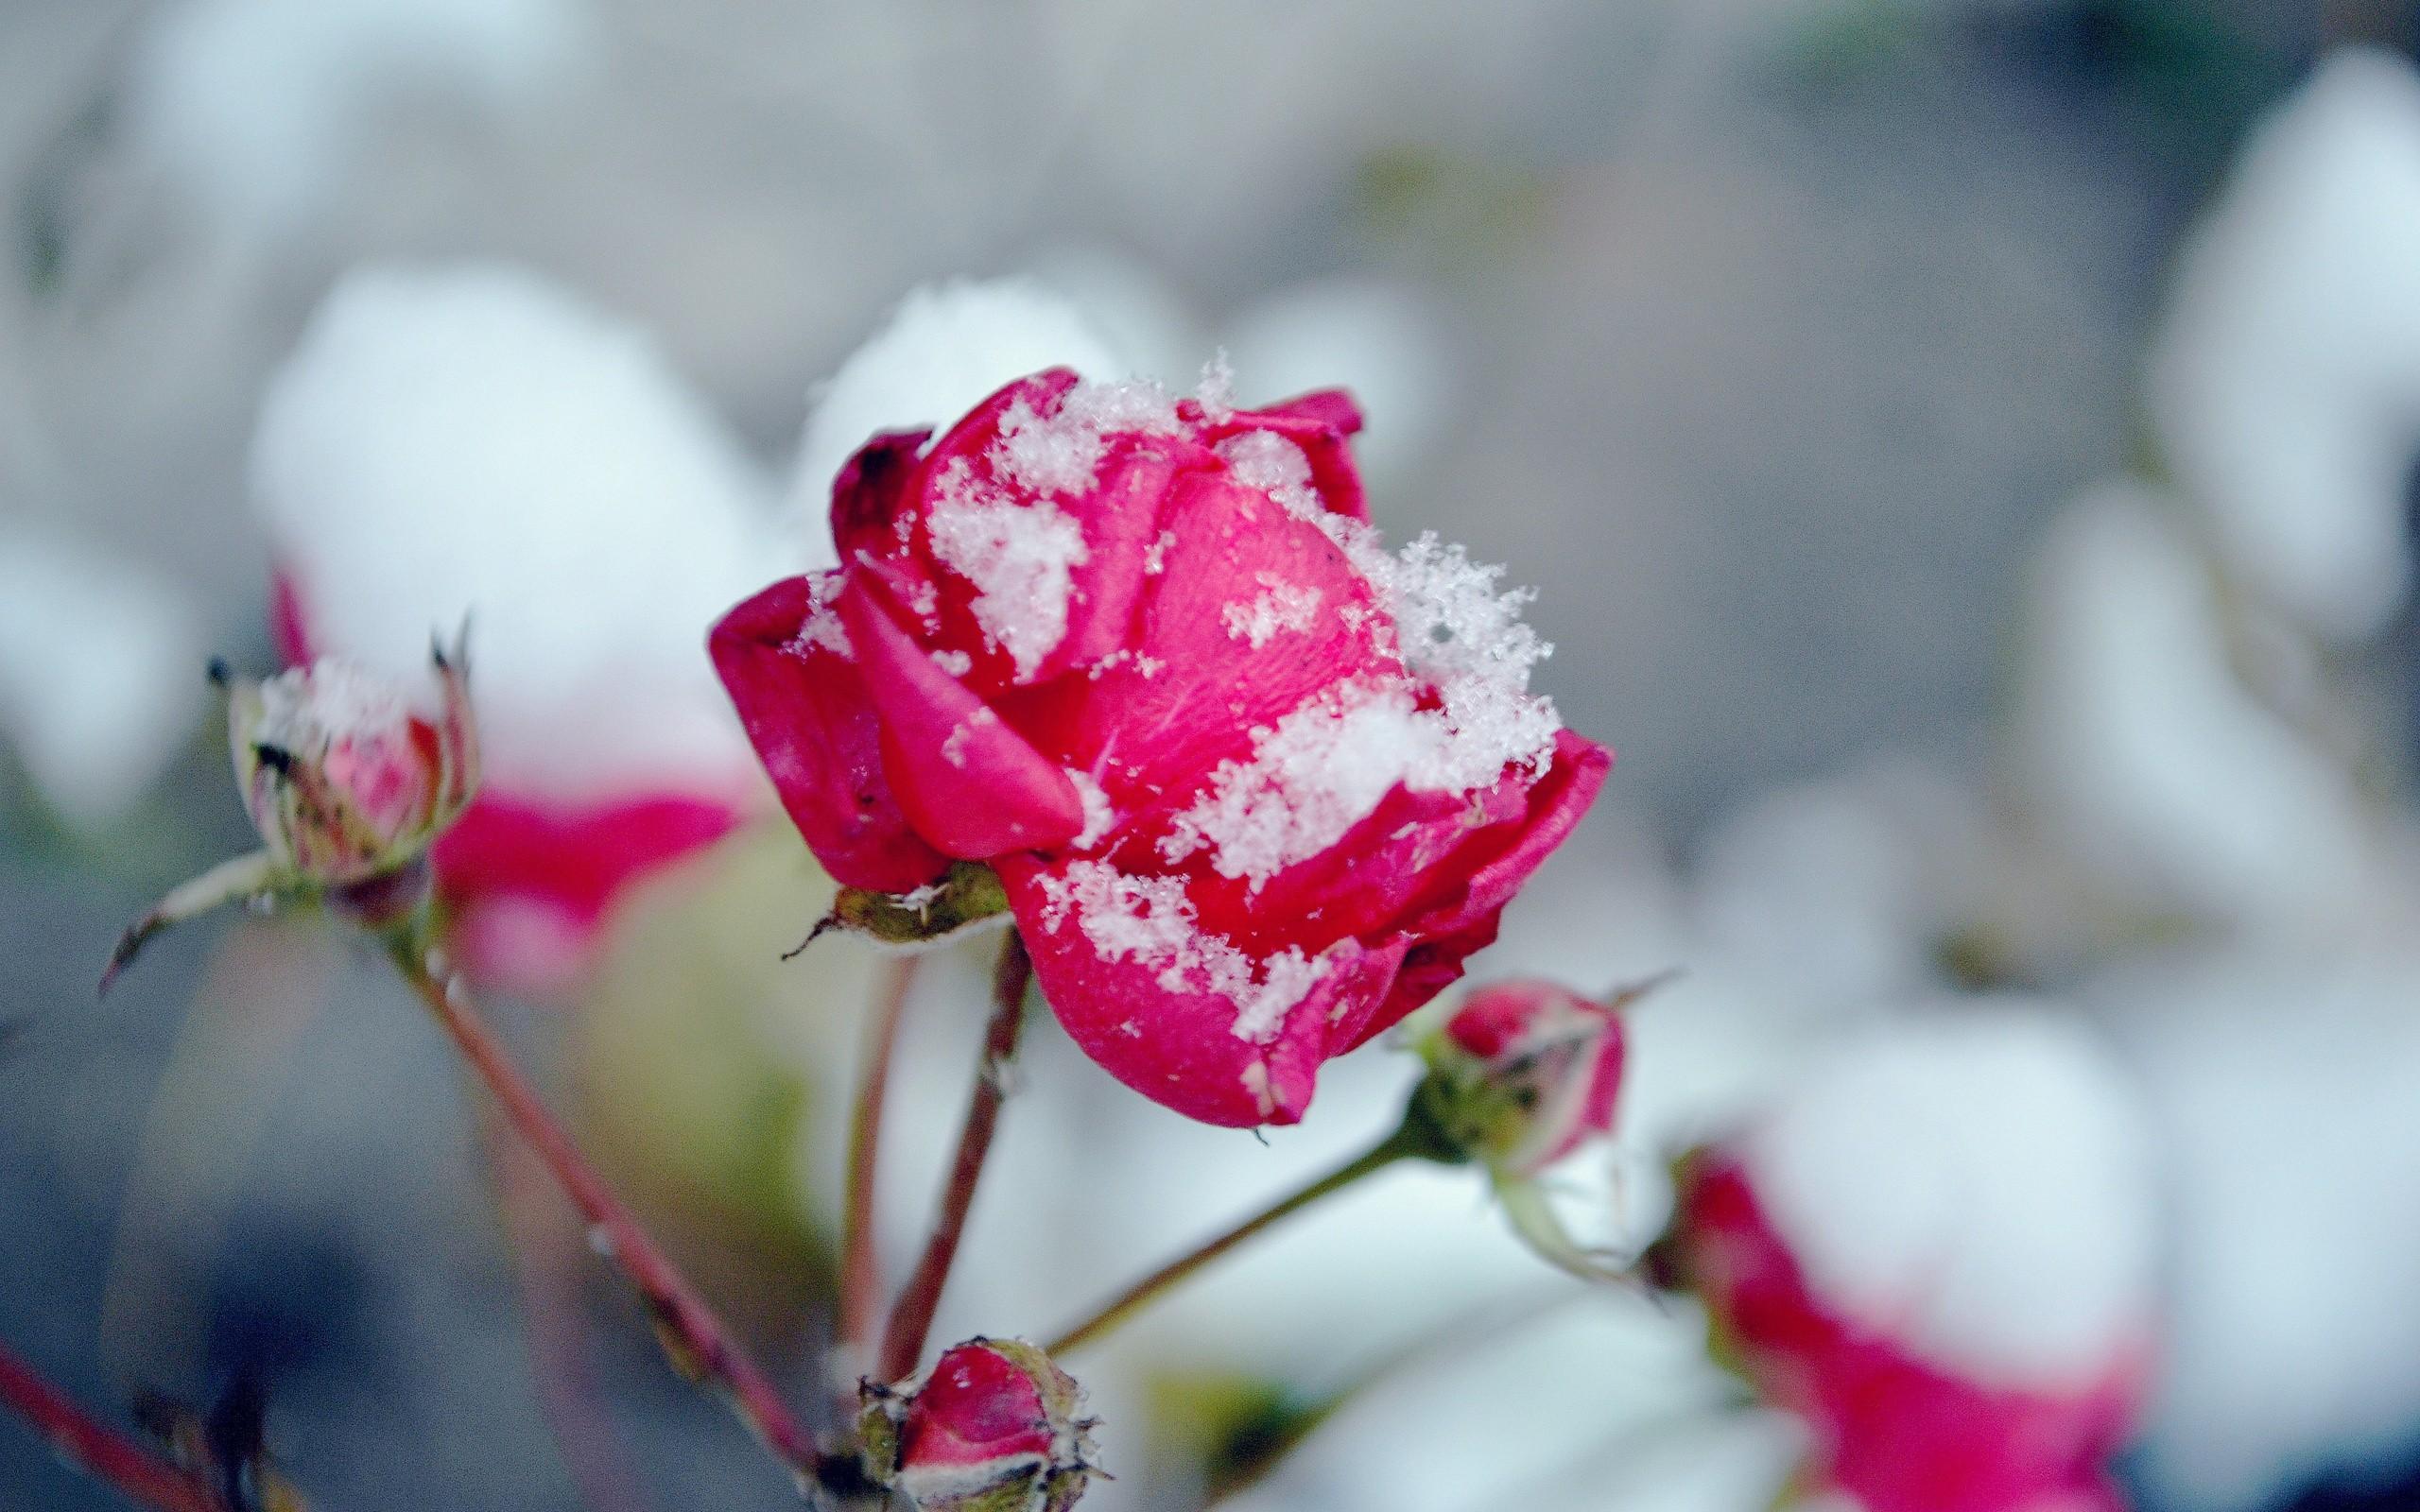 Snow on pink rose wallpaper 2560x1600 2656 wallpaperup - Rose in snow wallpaper ...